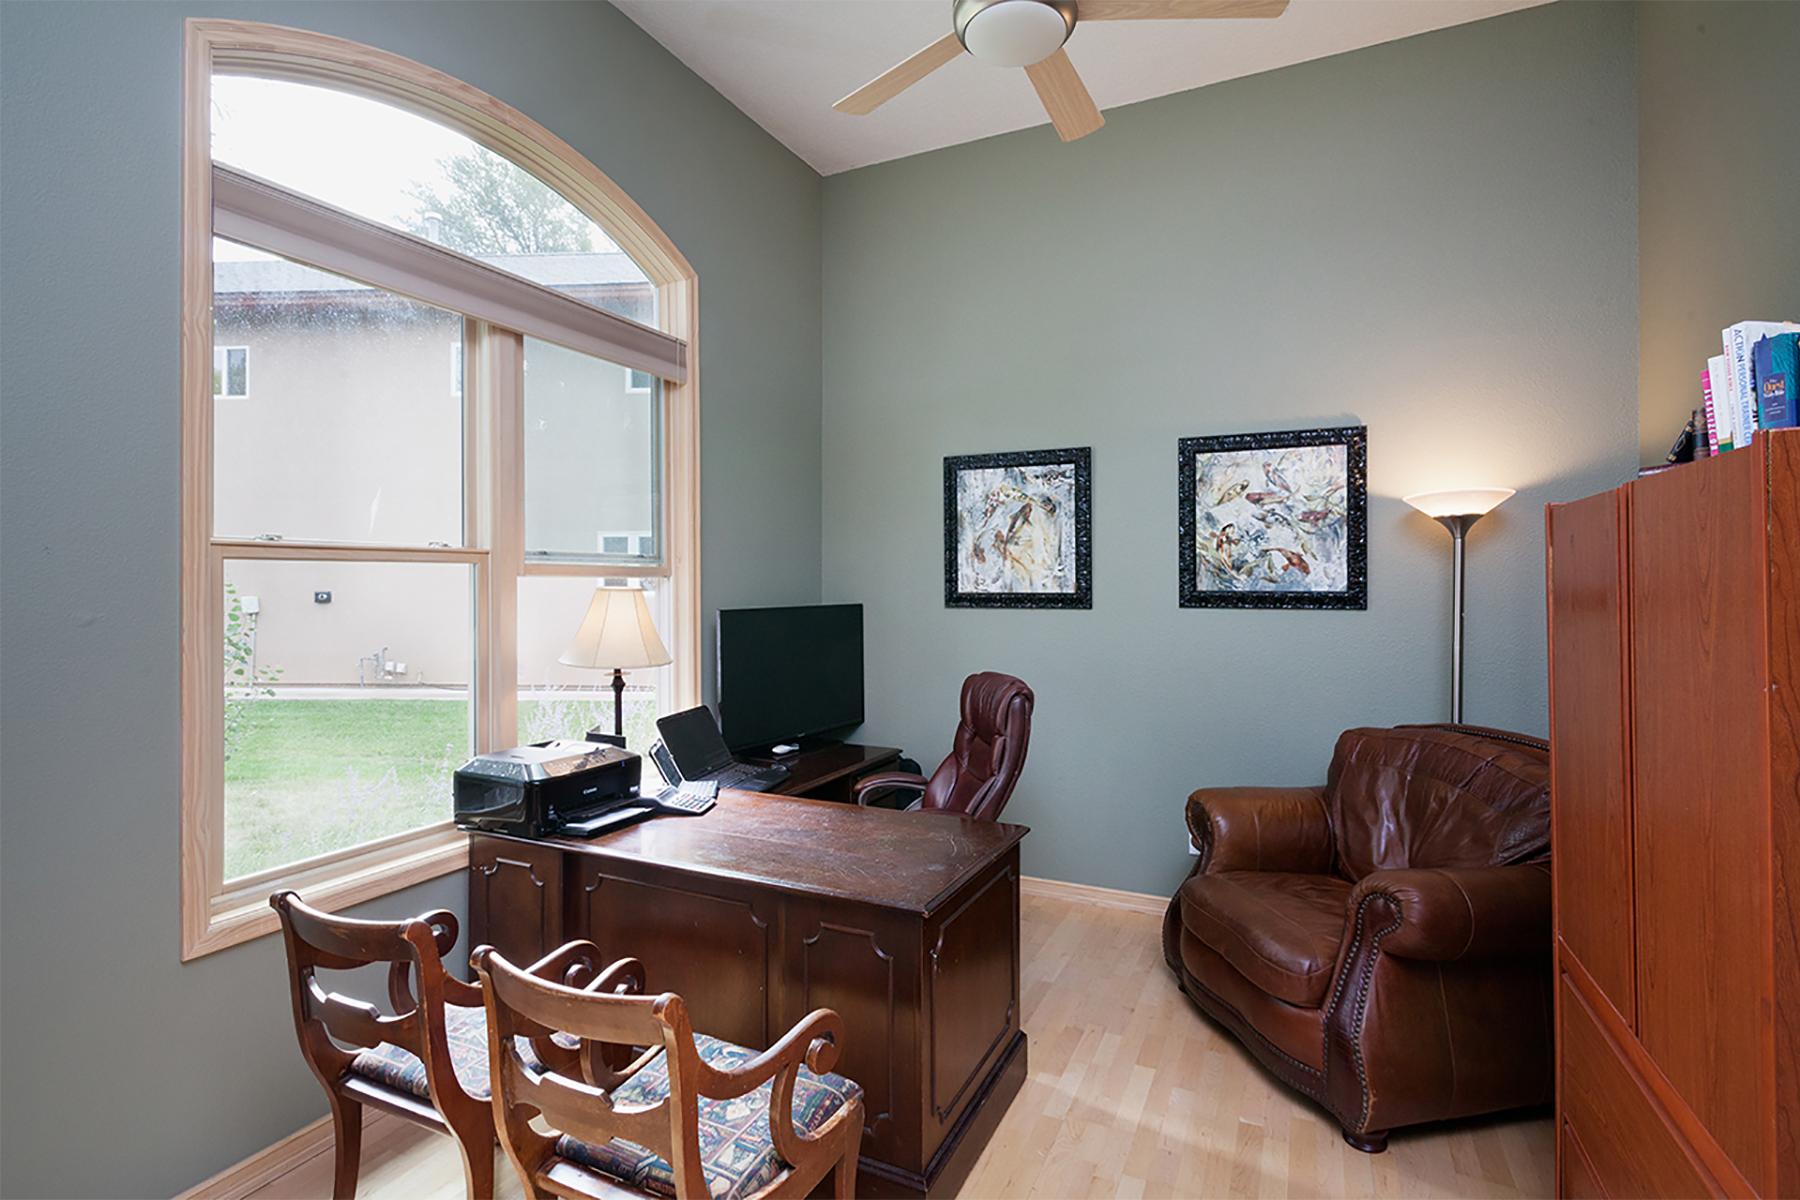 Additional photo for property listing at 590 Horse Thief Lane 590 Horse Thief Lane Durango, Colorado 81301 United States